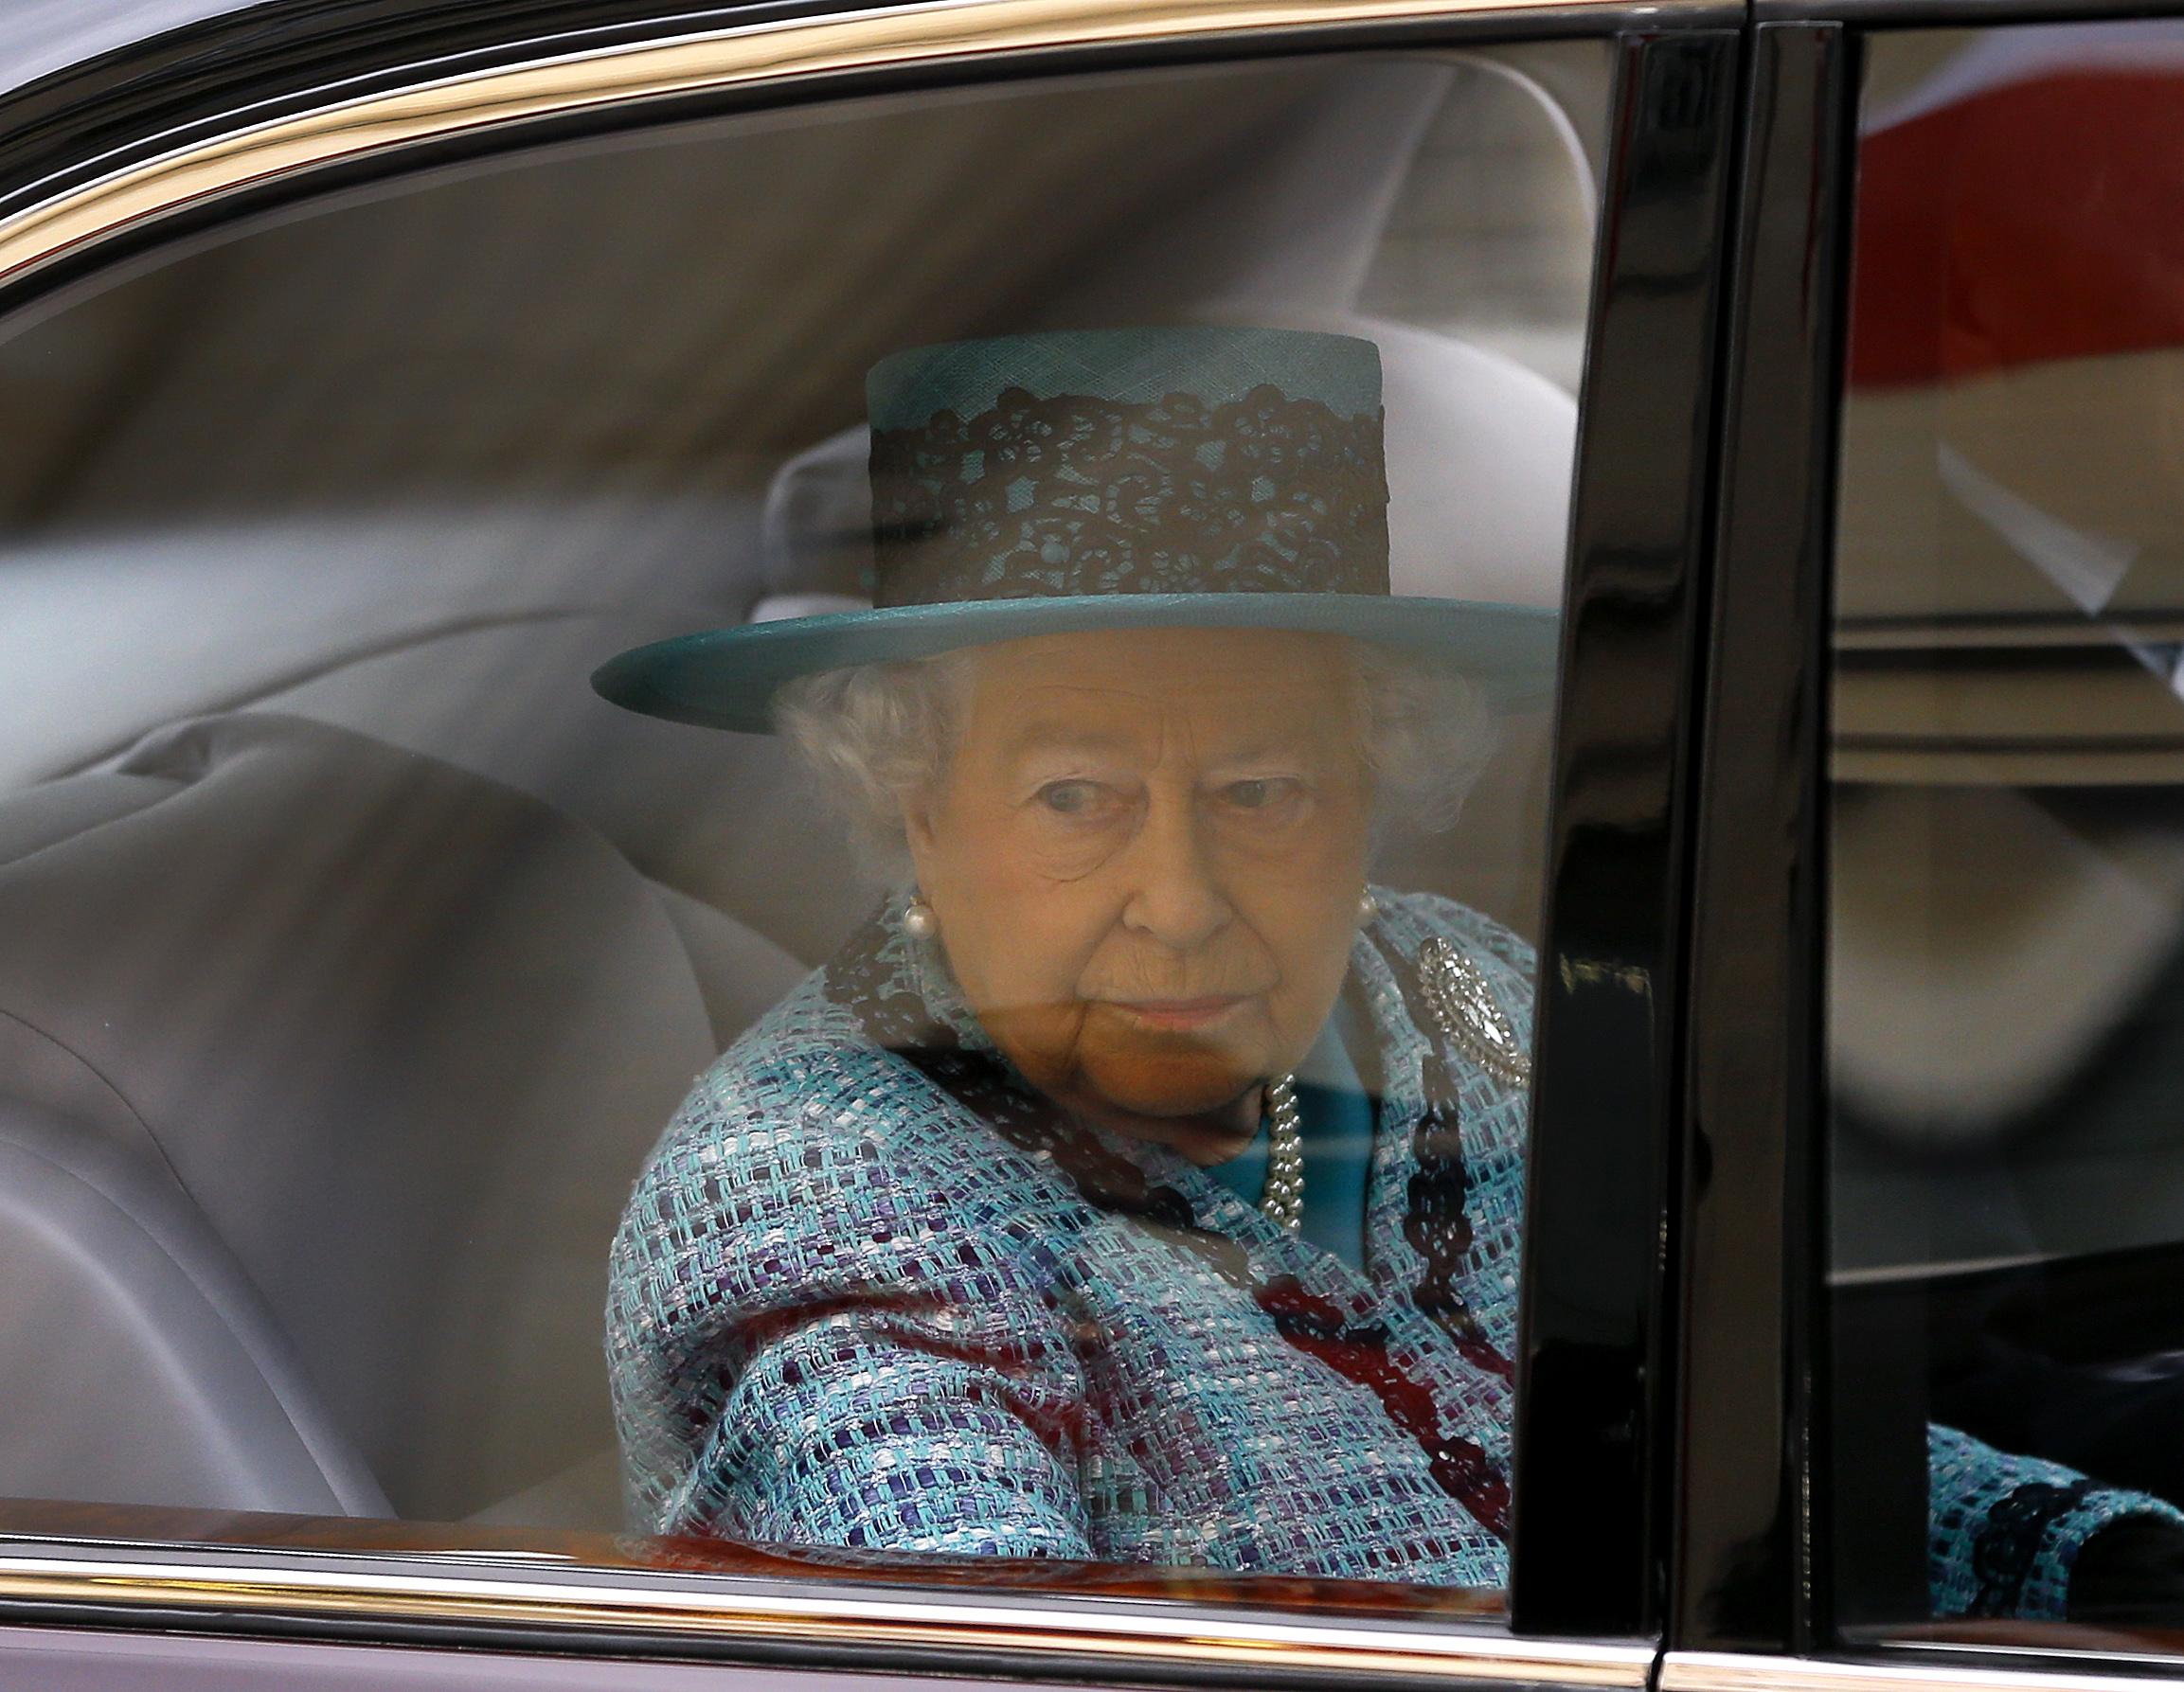 Queen Elizabeth II arrives to Canada House in London, England on Feb. 19, 2015.